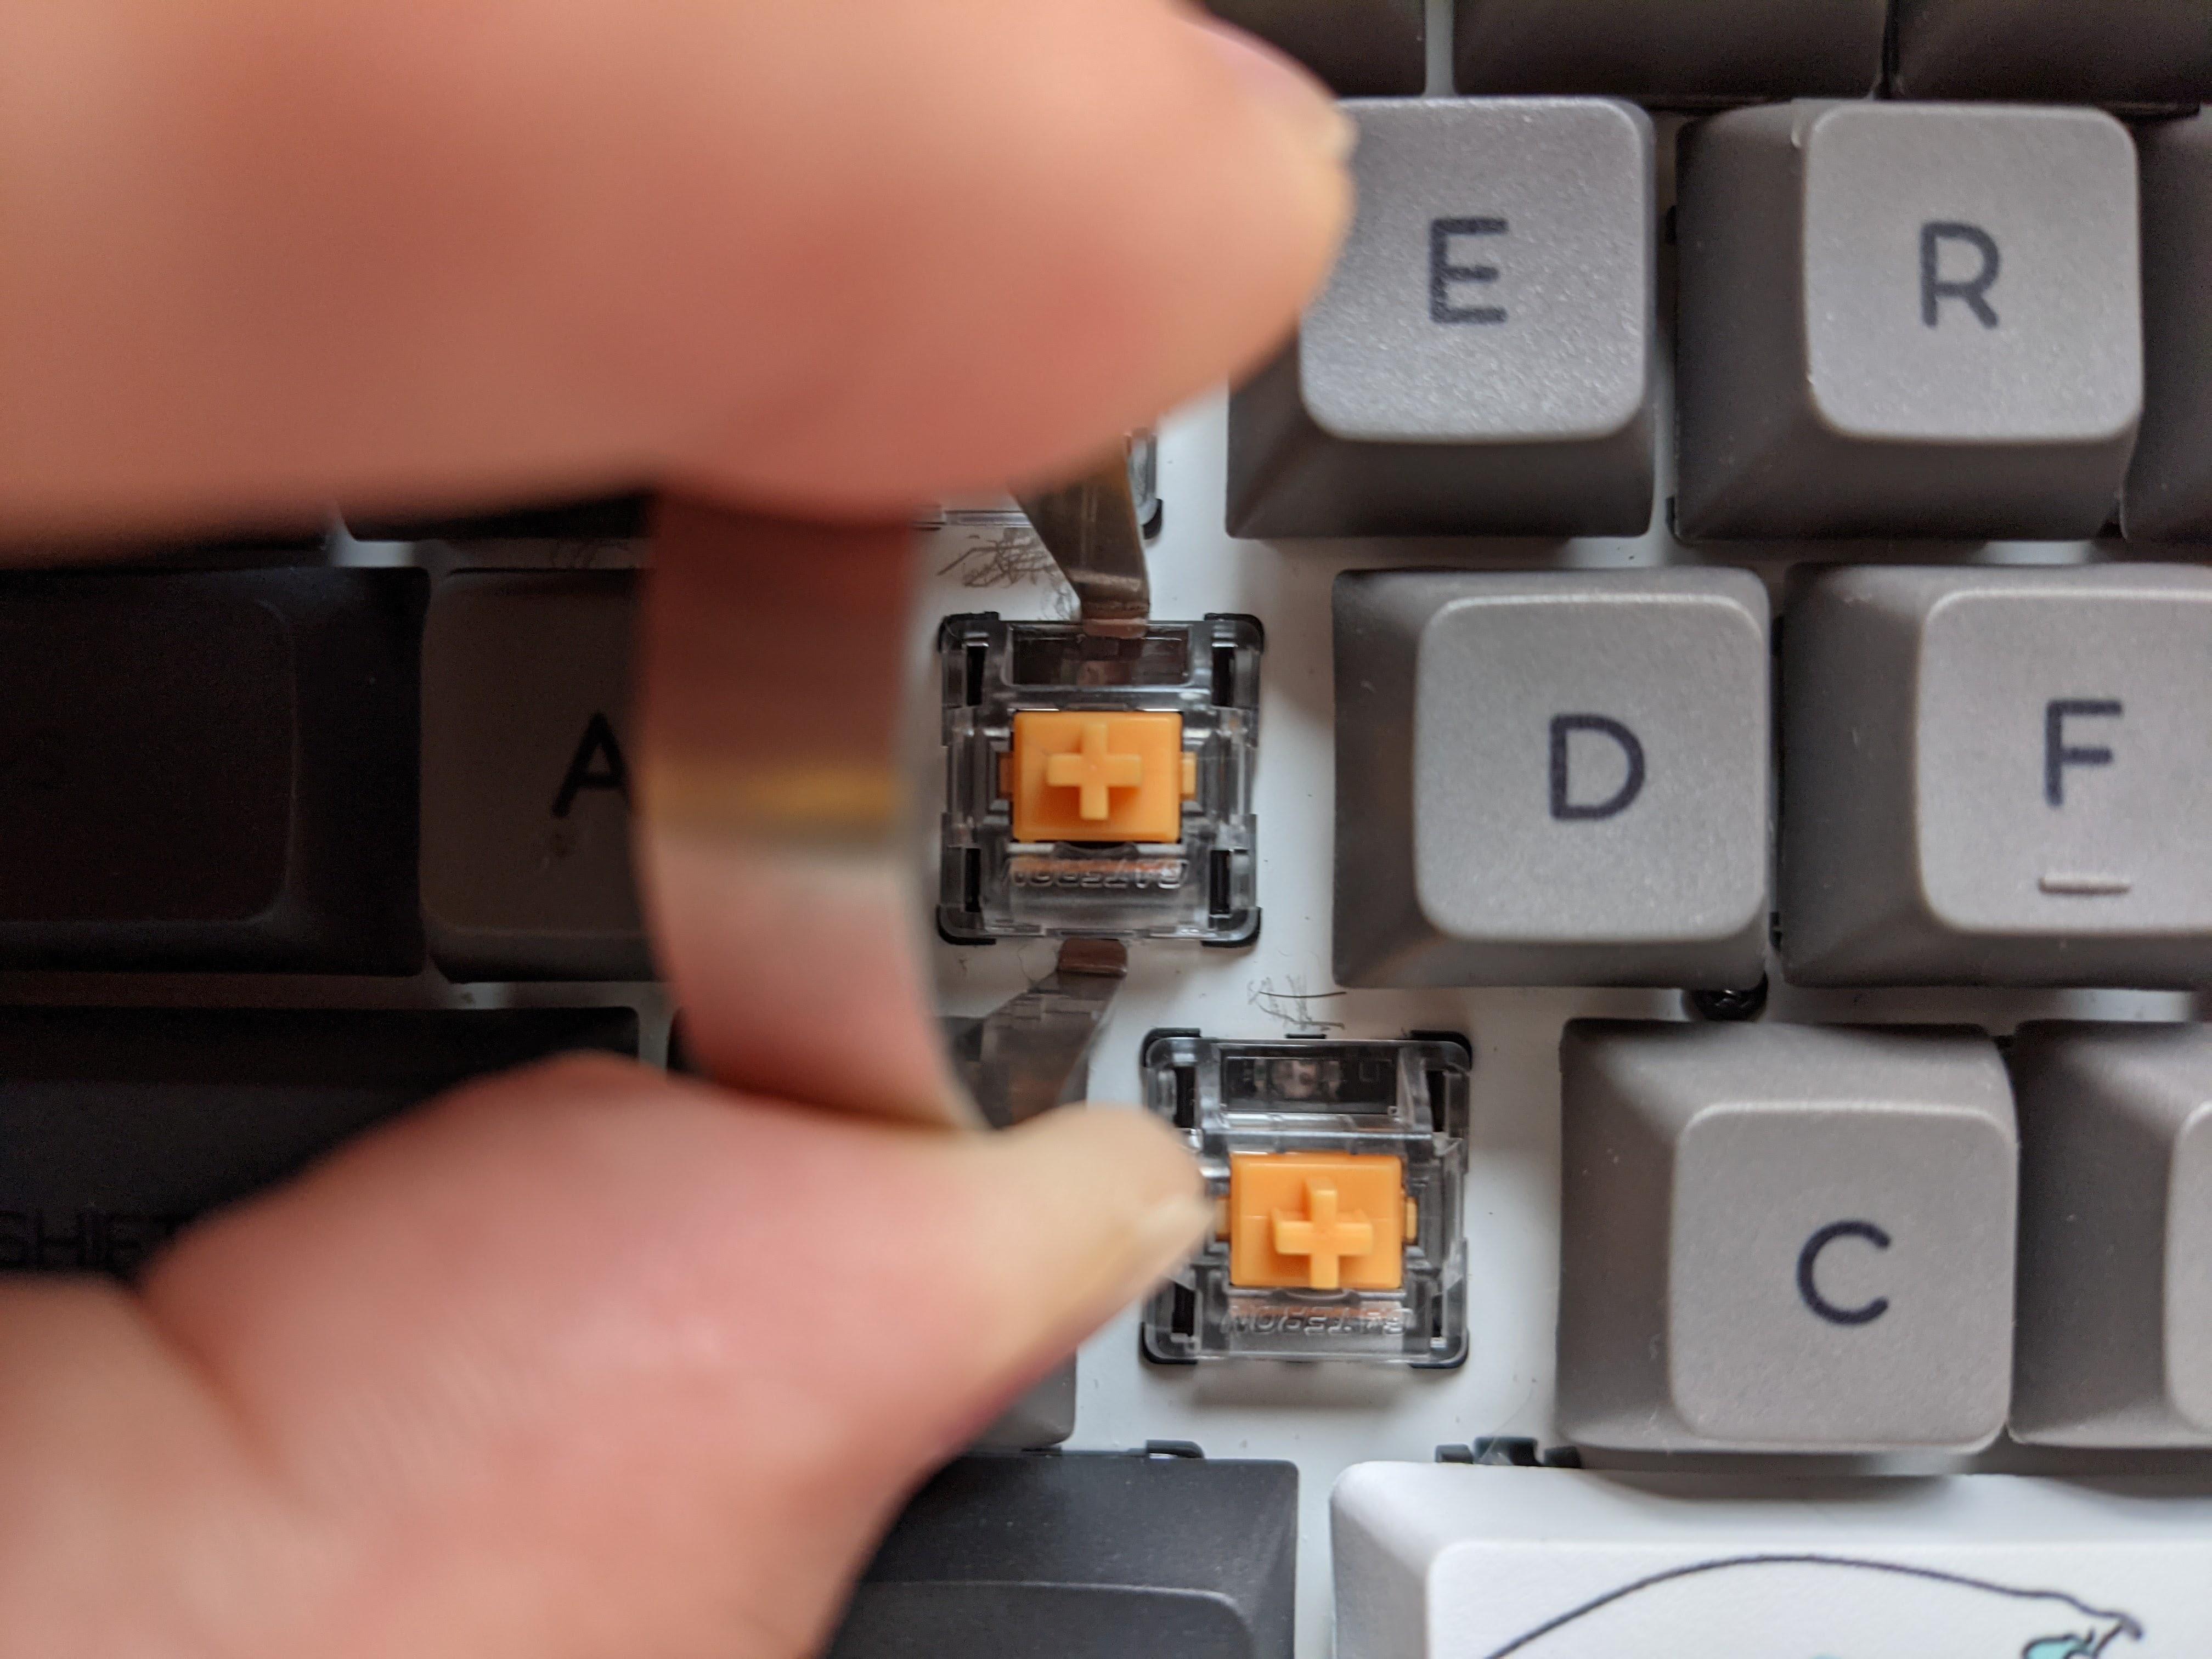 Gateron 光学式キースイッチを交換する